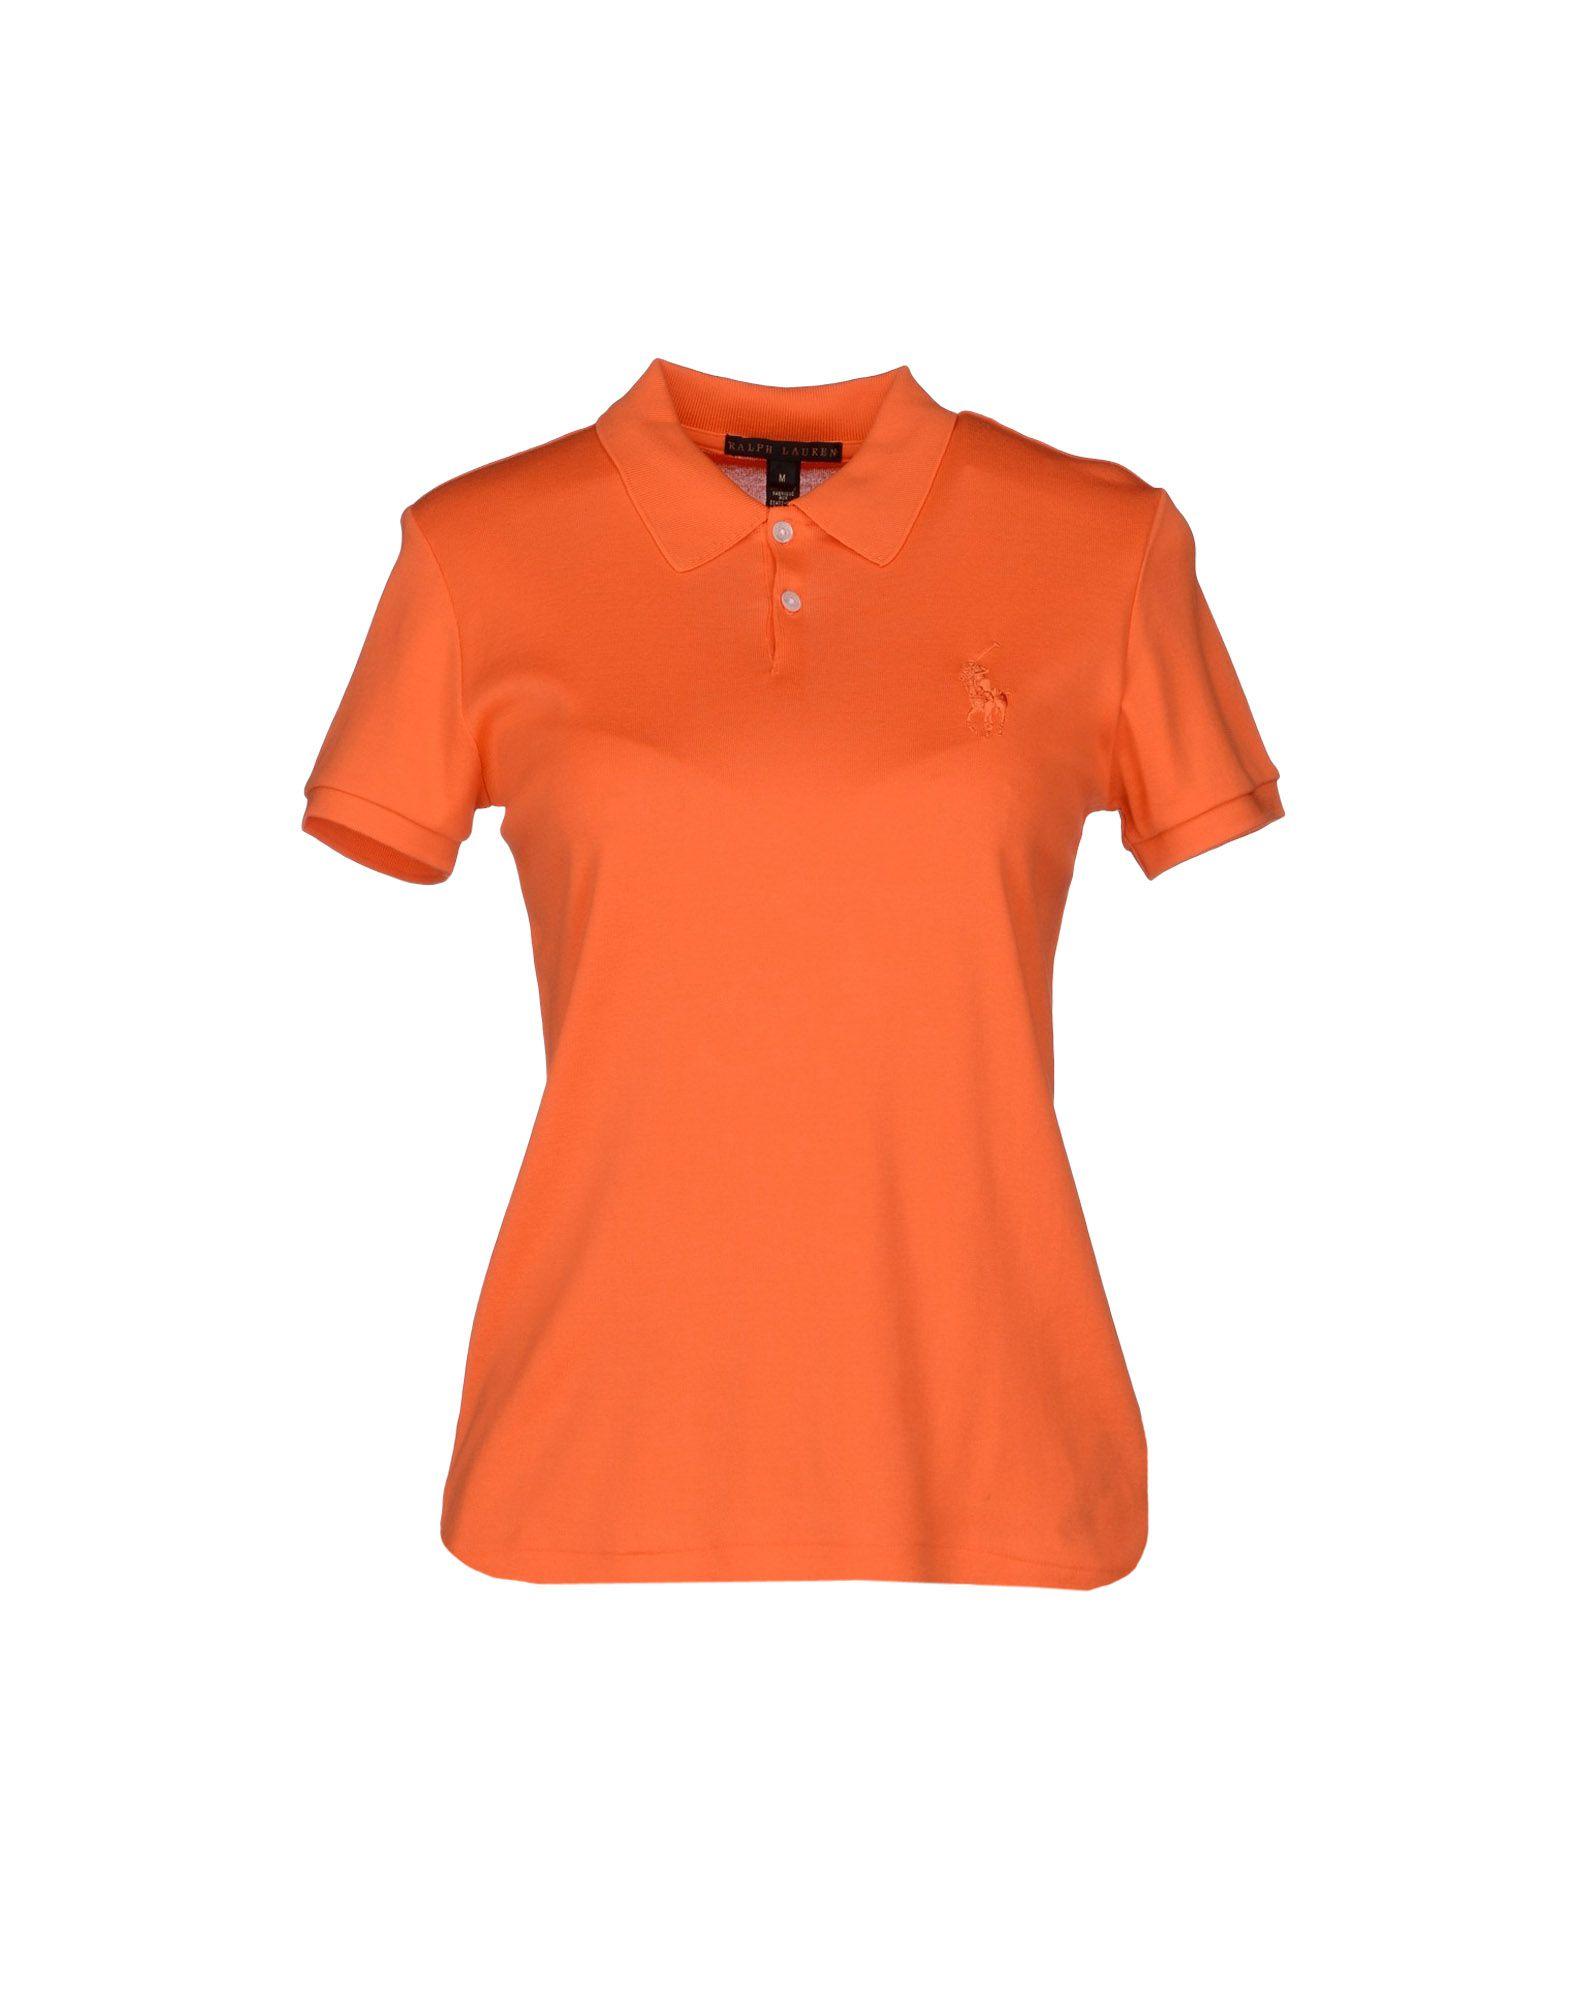 Ralph lauren black label polo shirt in orange lyst for Ralph lauren black label polo shirt